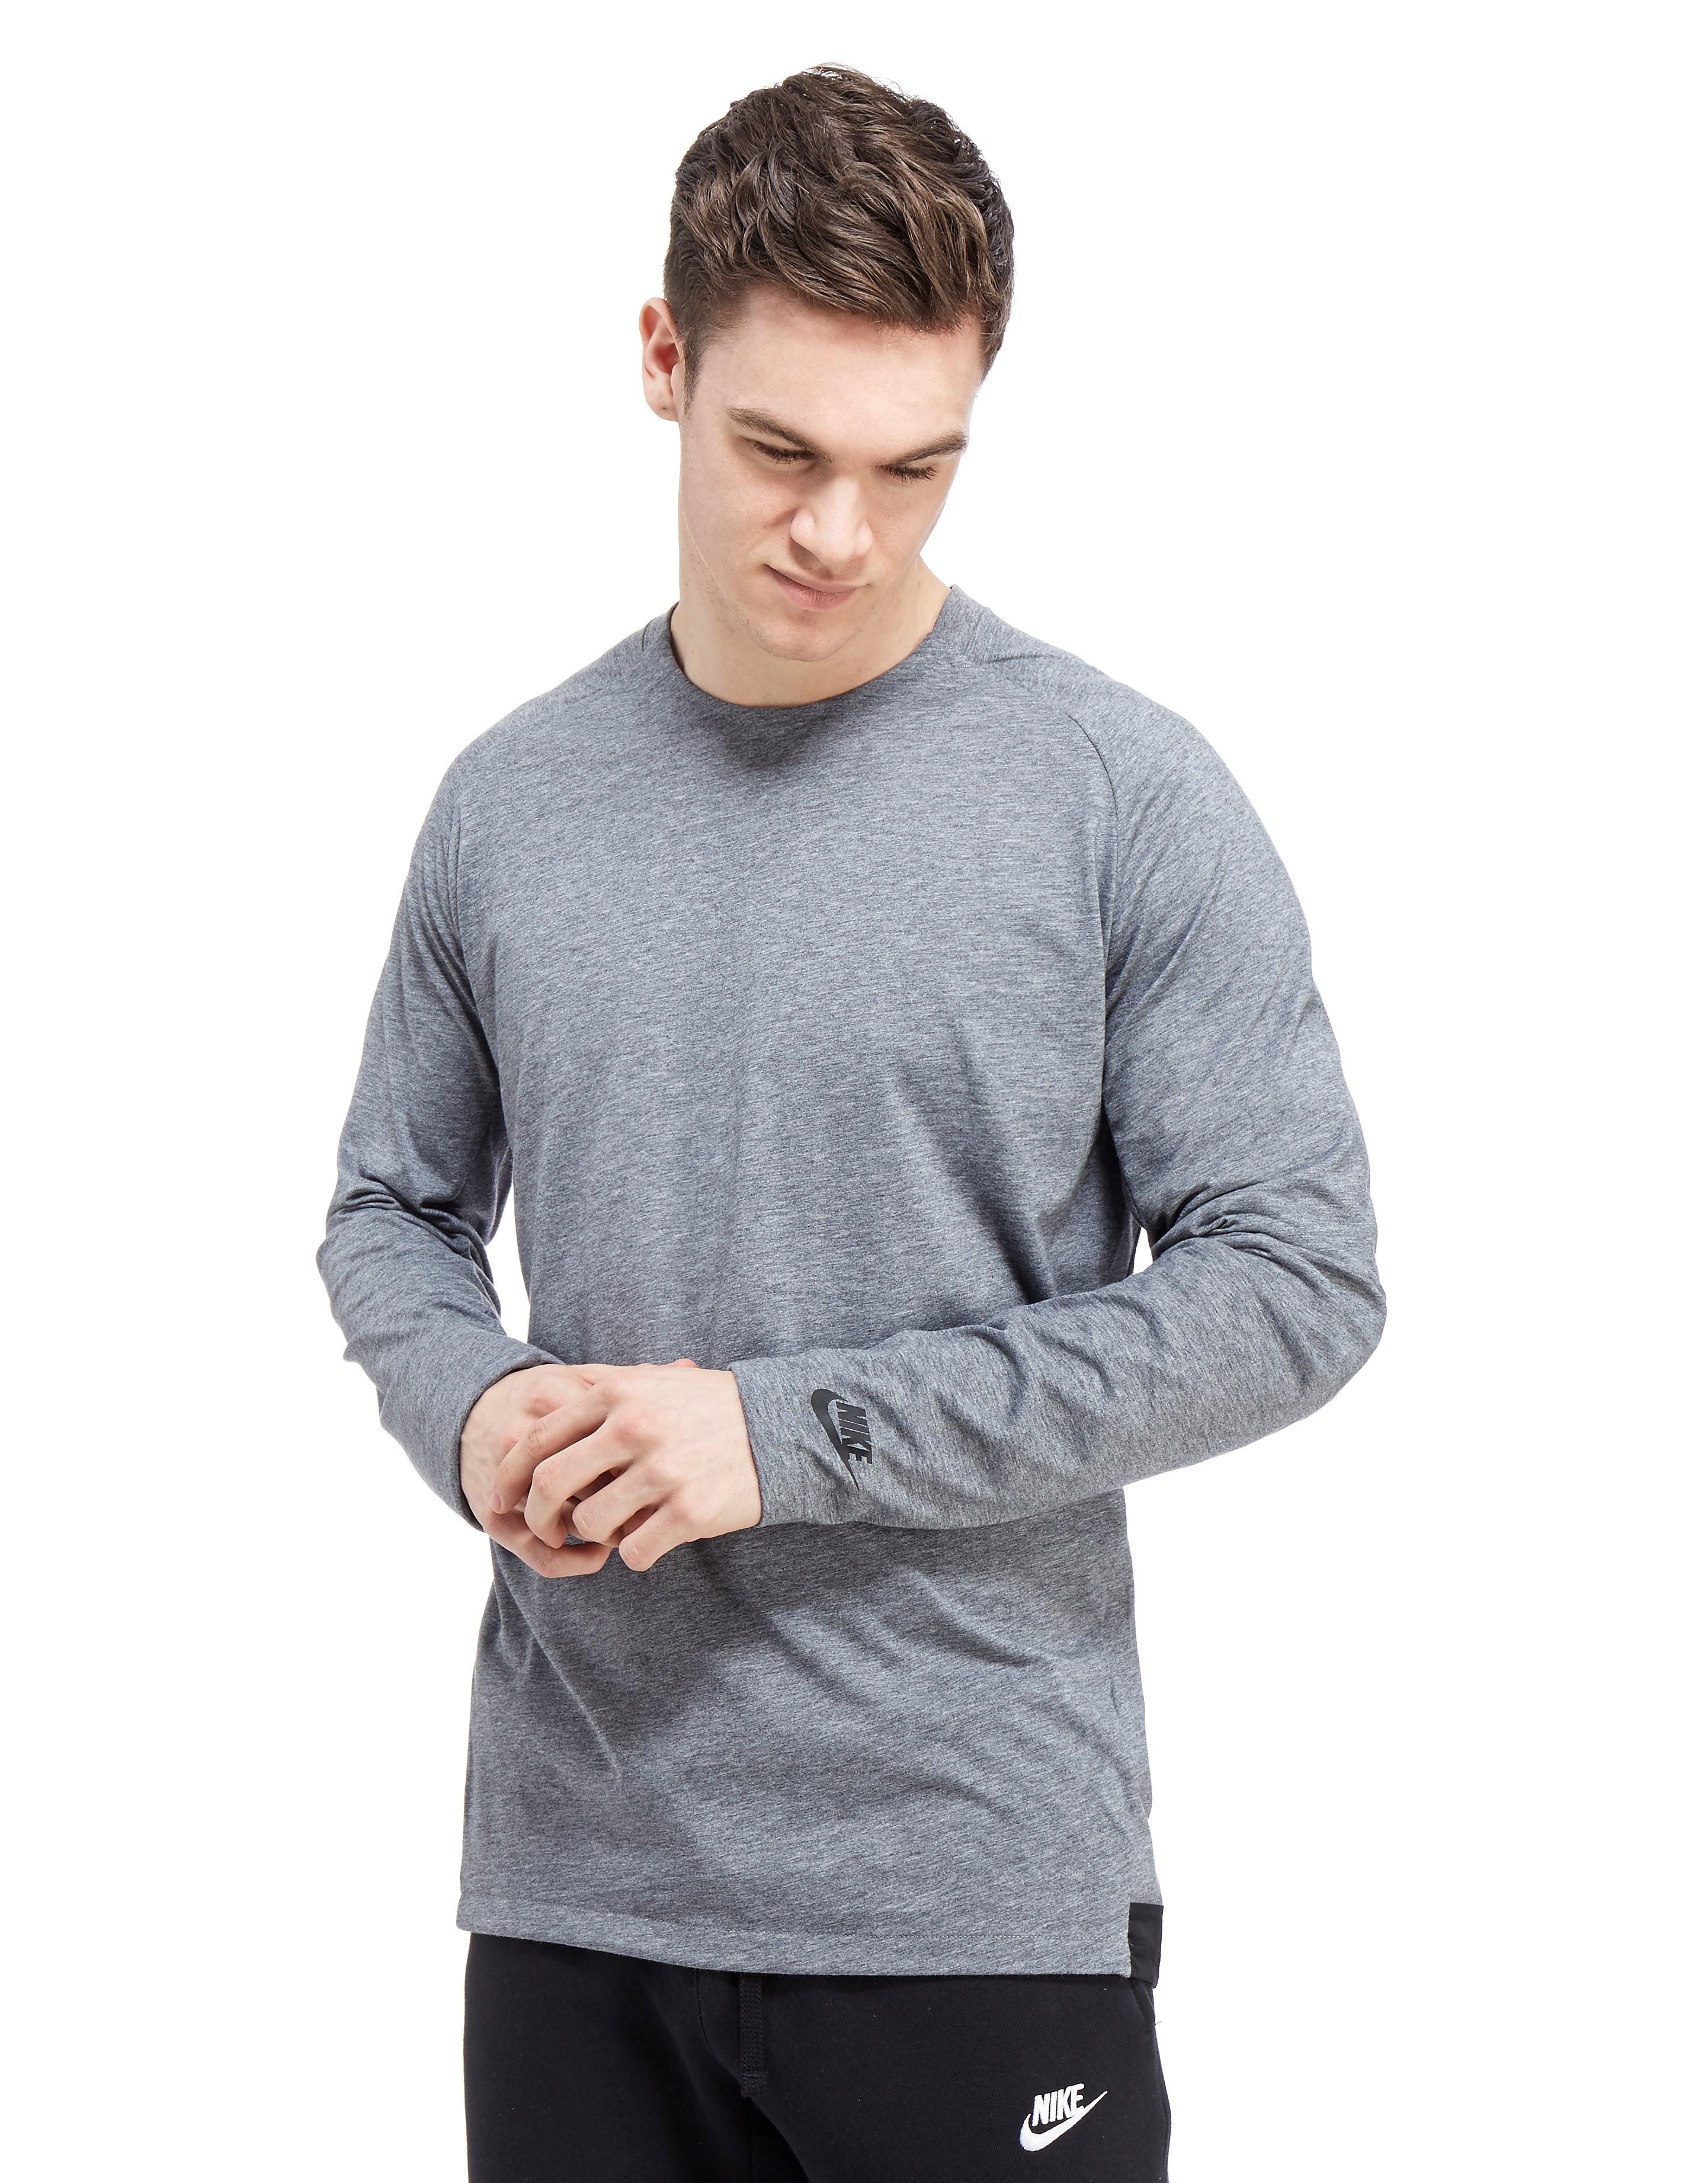 Nike Bonded Longsleeve T-Shirt